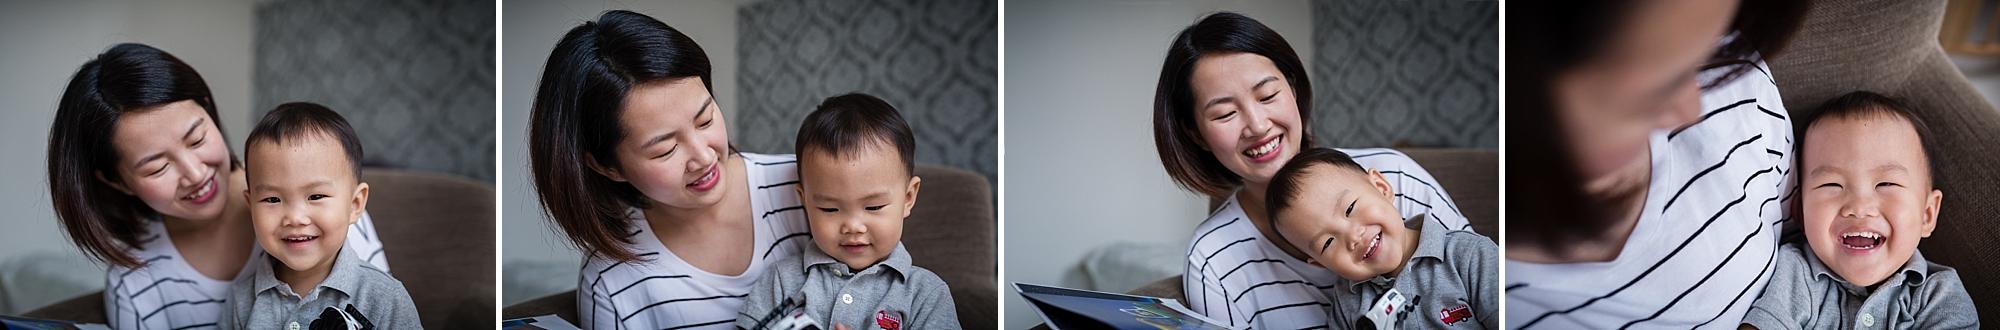 In_Home_Newborn_Family_Photos_Taipei_Hunnicutt_Photography_0004